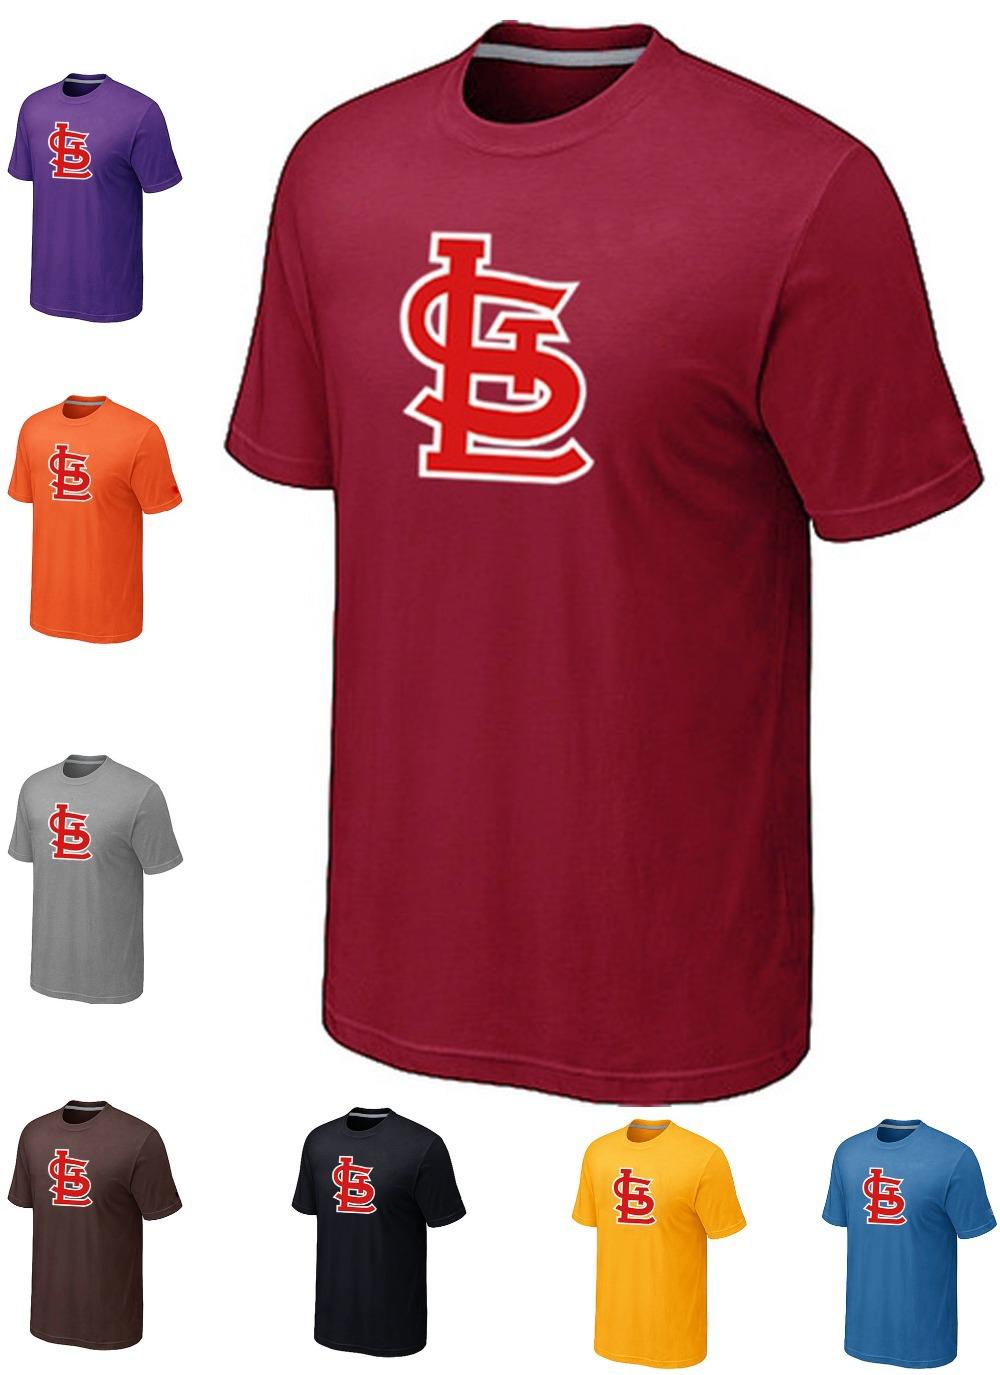 Cheap Cotton St.Louis CardinalsBaseball T Shirts Short Sleeve O-Neck Heathered Blended T-shirt Factory wholesale14 Colors(China (Mainland))